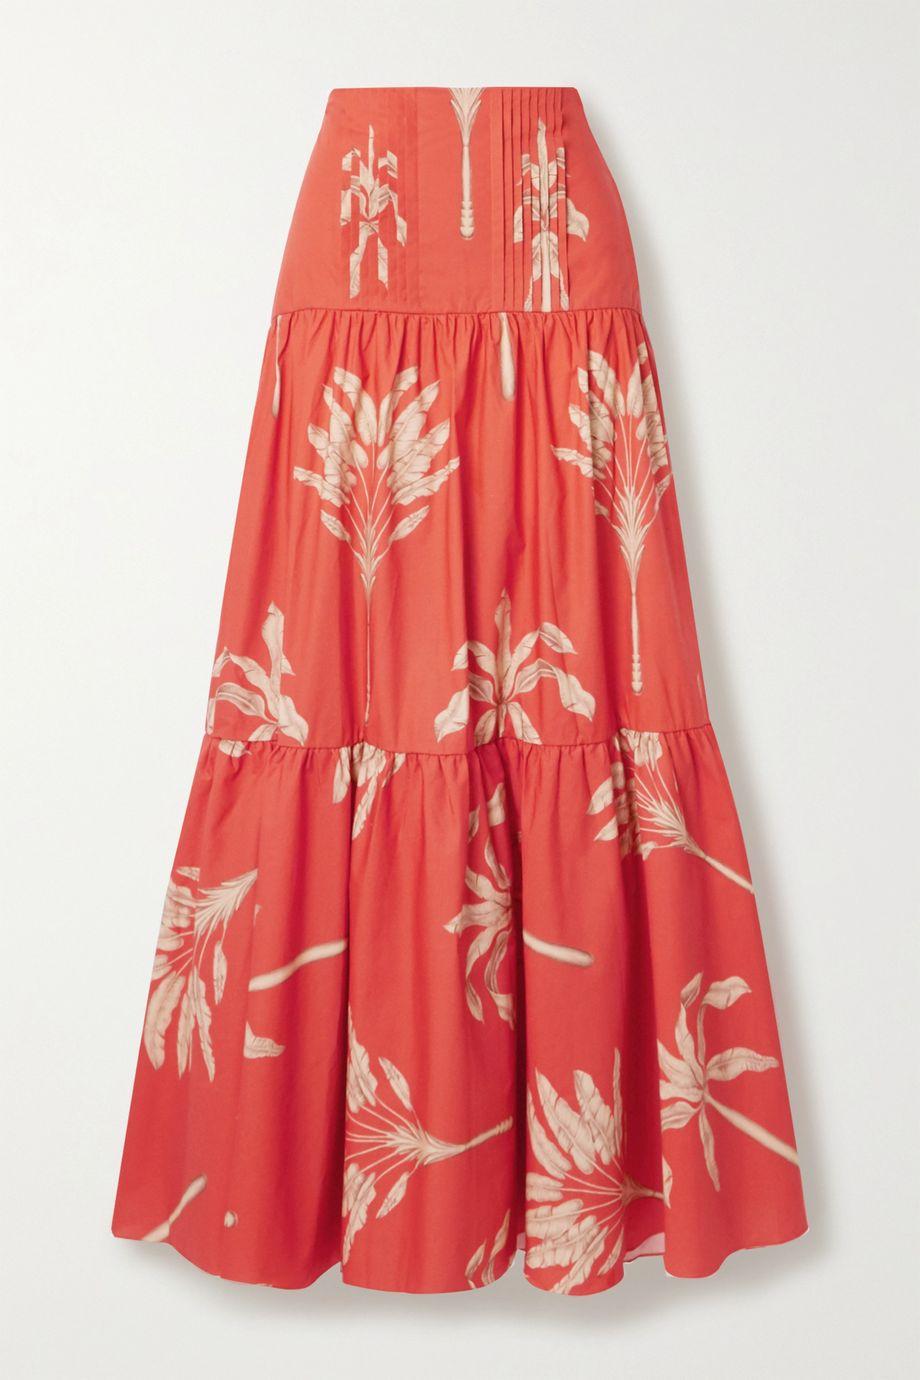 Johanna Ortiz Powerful Rhythm tiered printed cotton maxi skirt